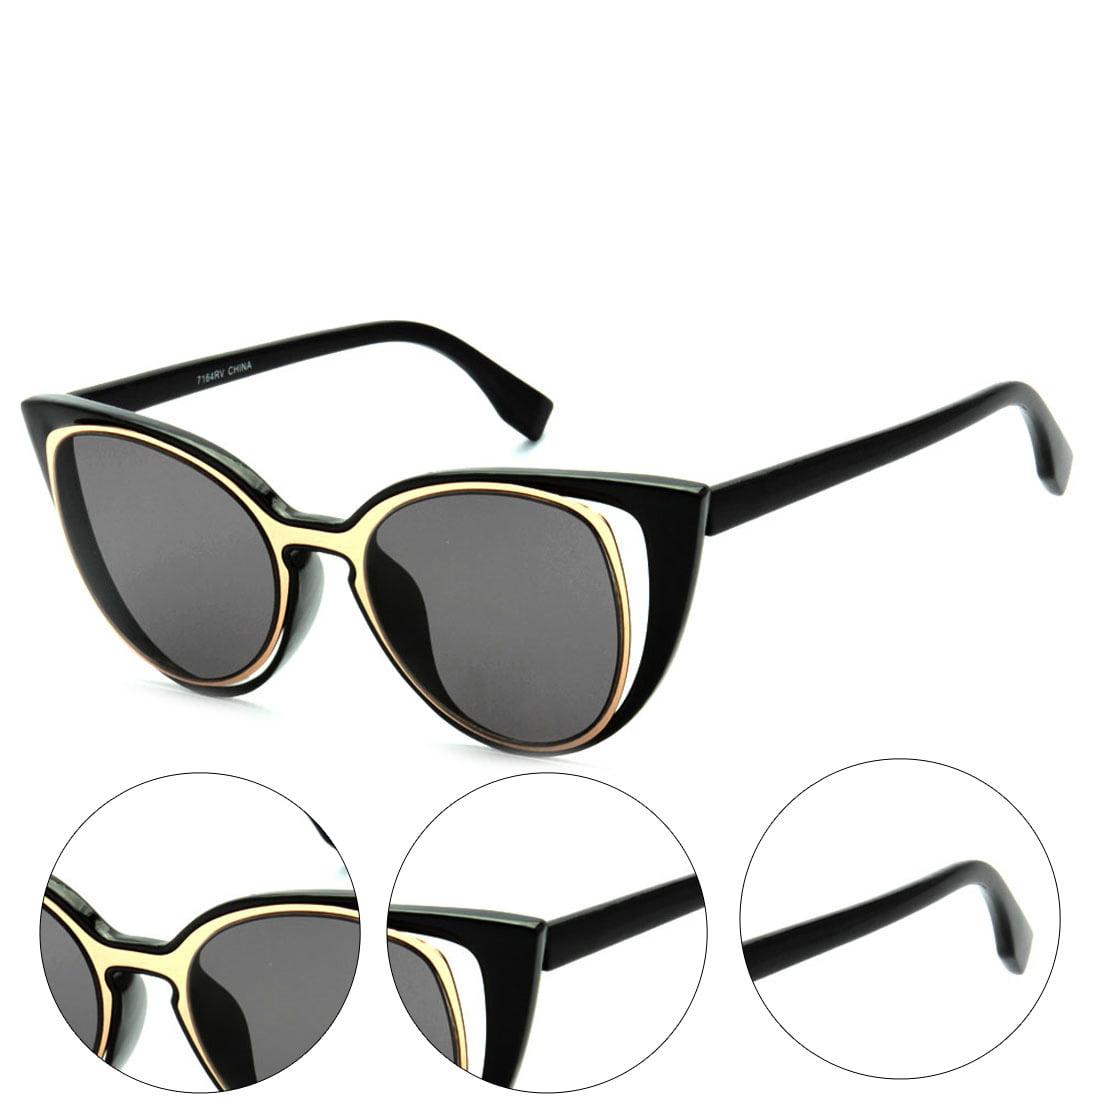 MLC Eyewear Urban Fashion Double Frame Catty Cateye Women Sunglasses